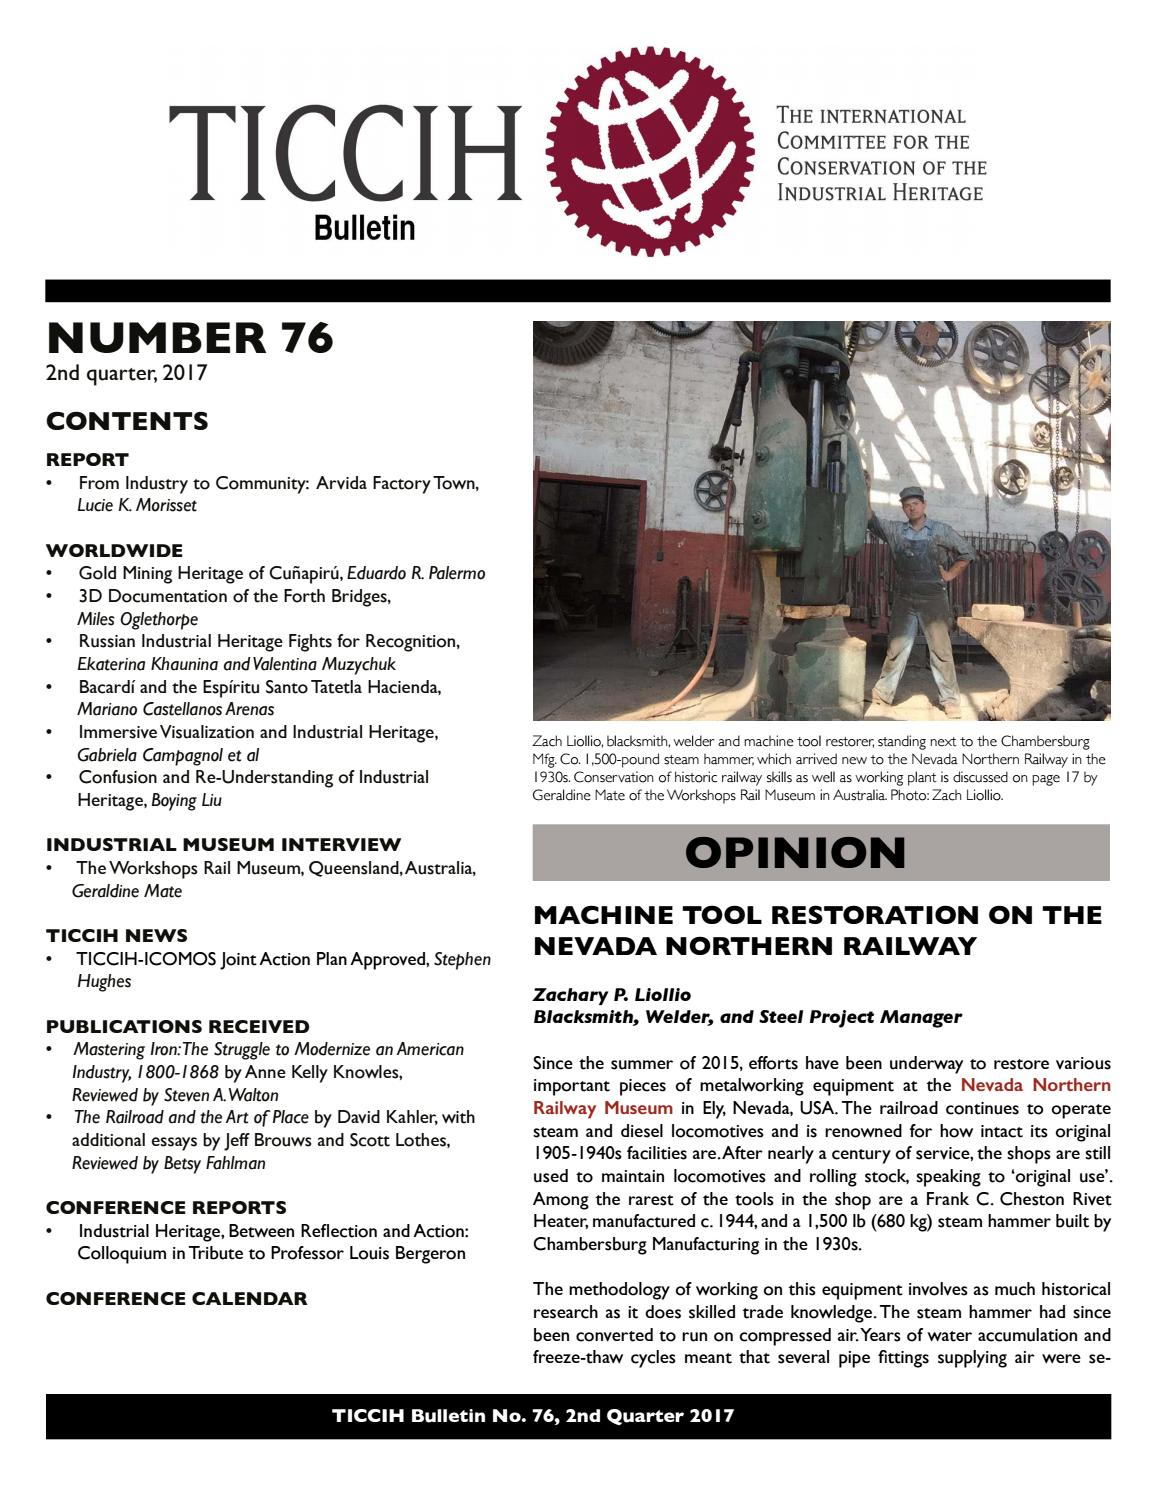 TICCIH Bulletin No  76 2nd Quarter 2017 by TICCIH - The